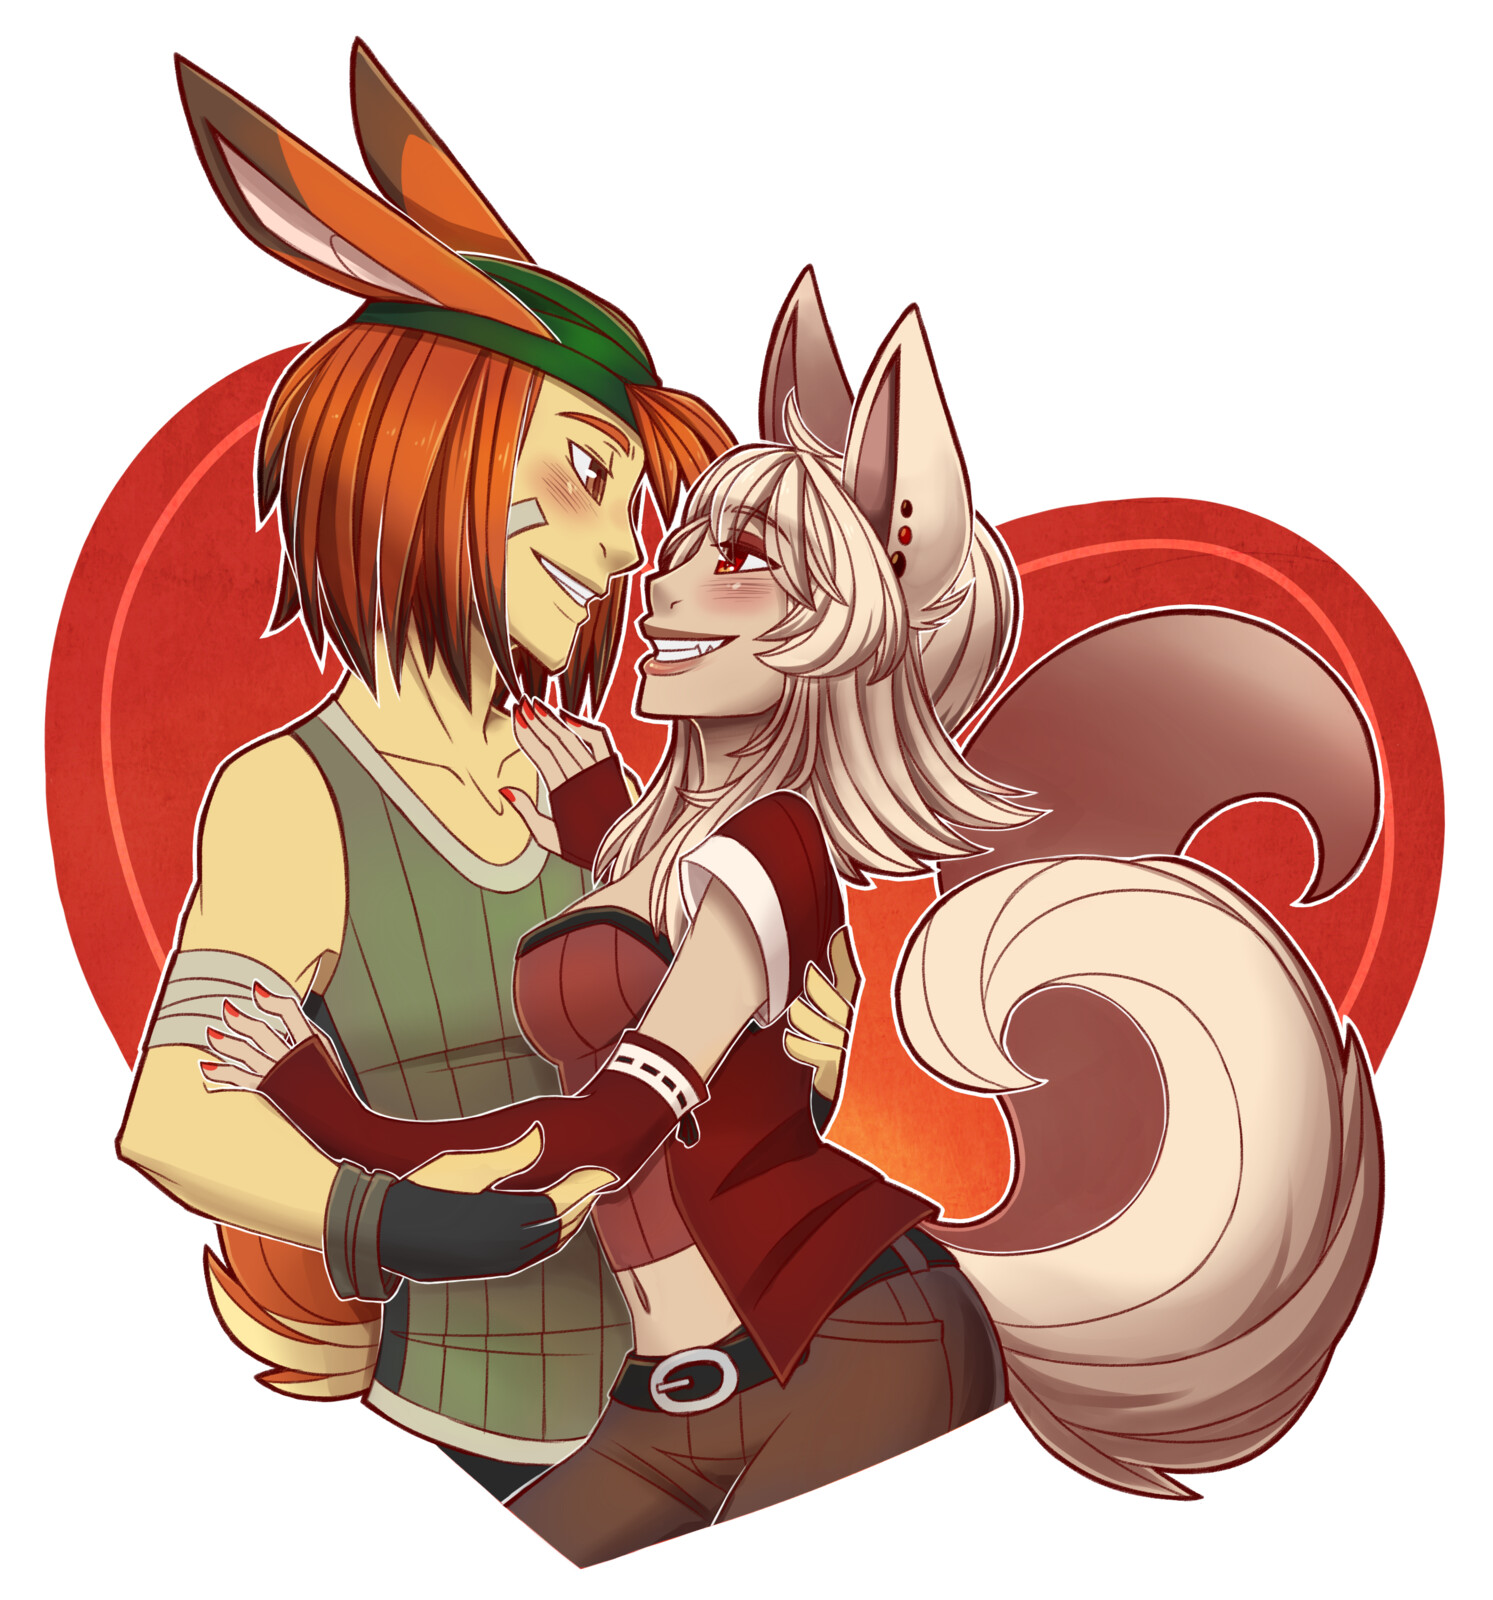 Ricki (MoonRabbit) and Yoko (Kitsune)